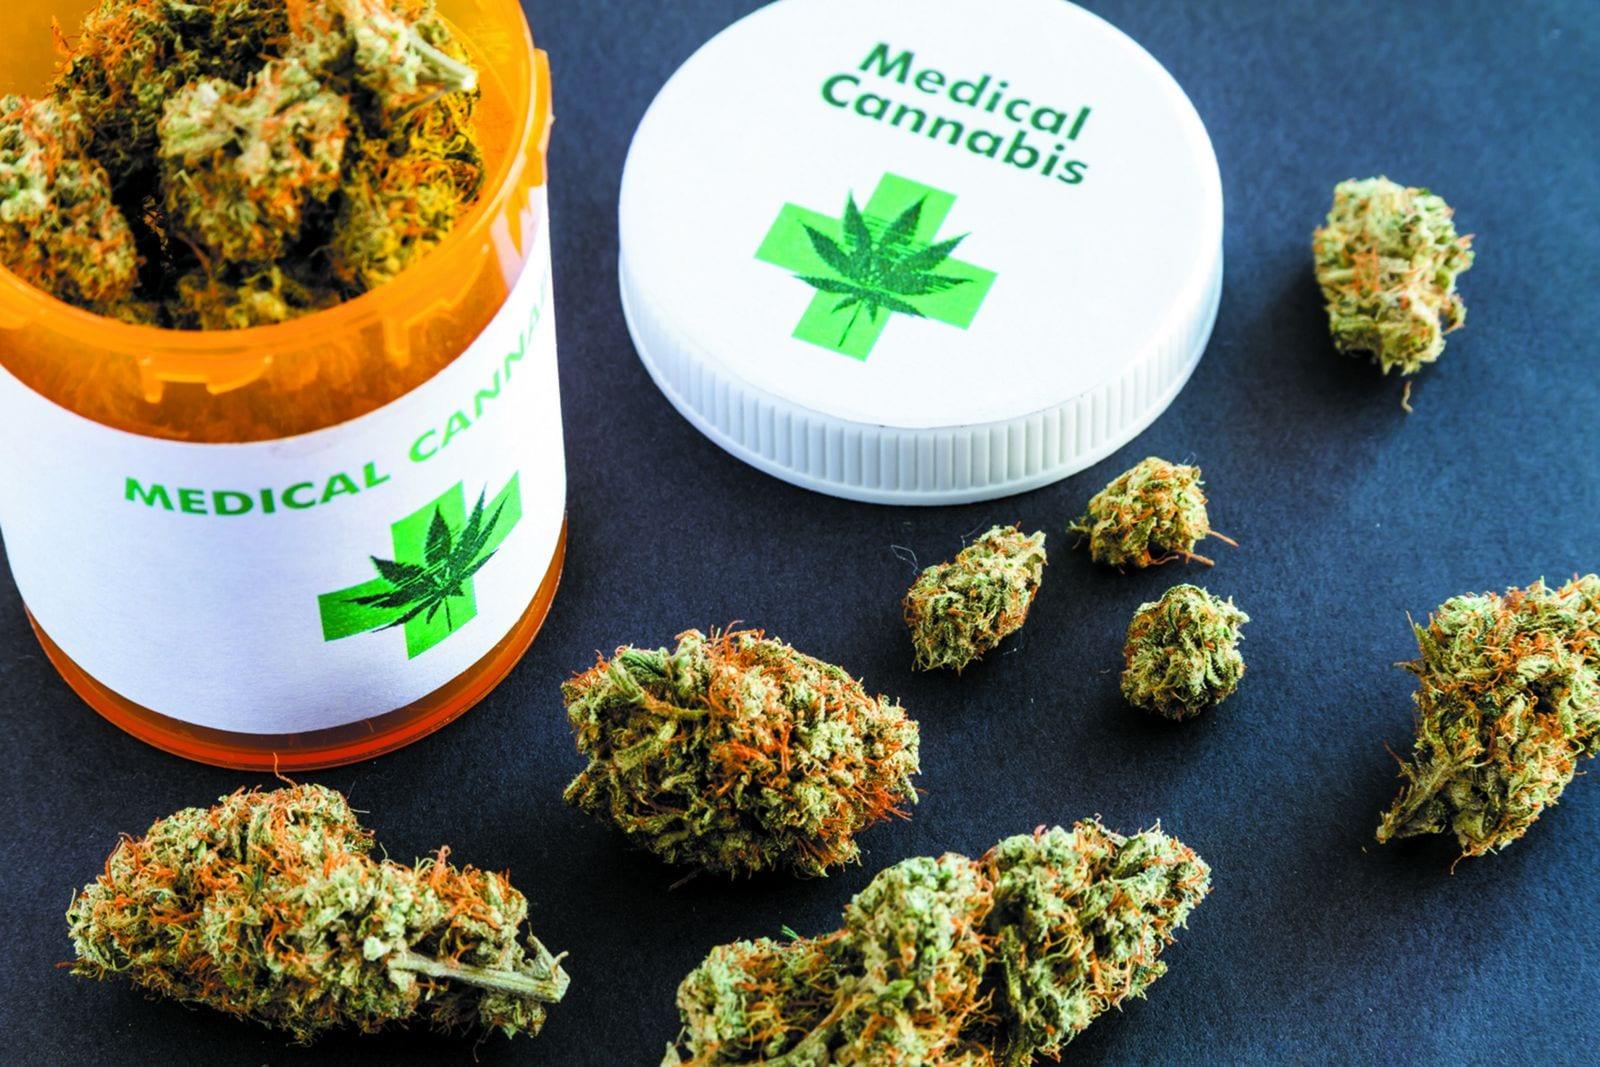 Medical marijuana needs to be handicap accessible